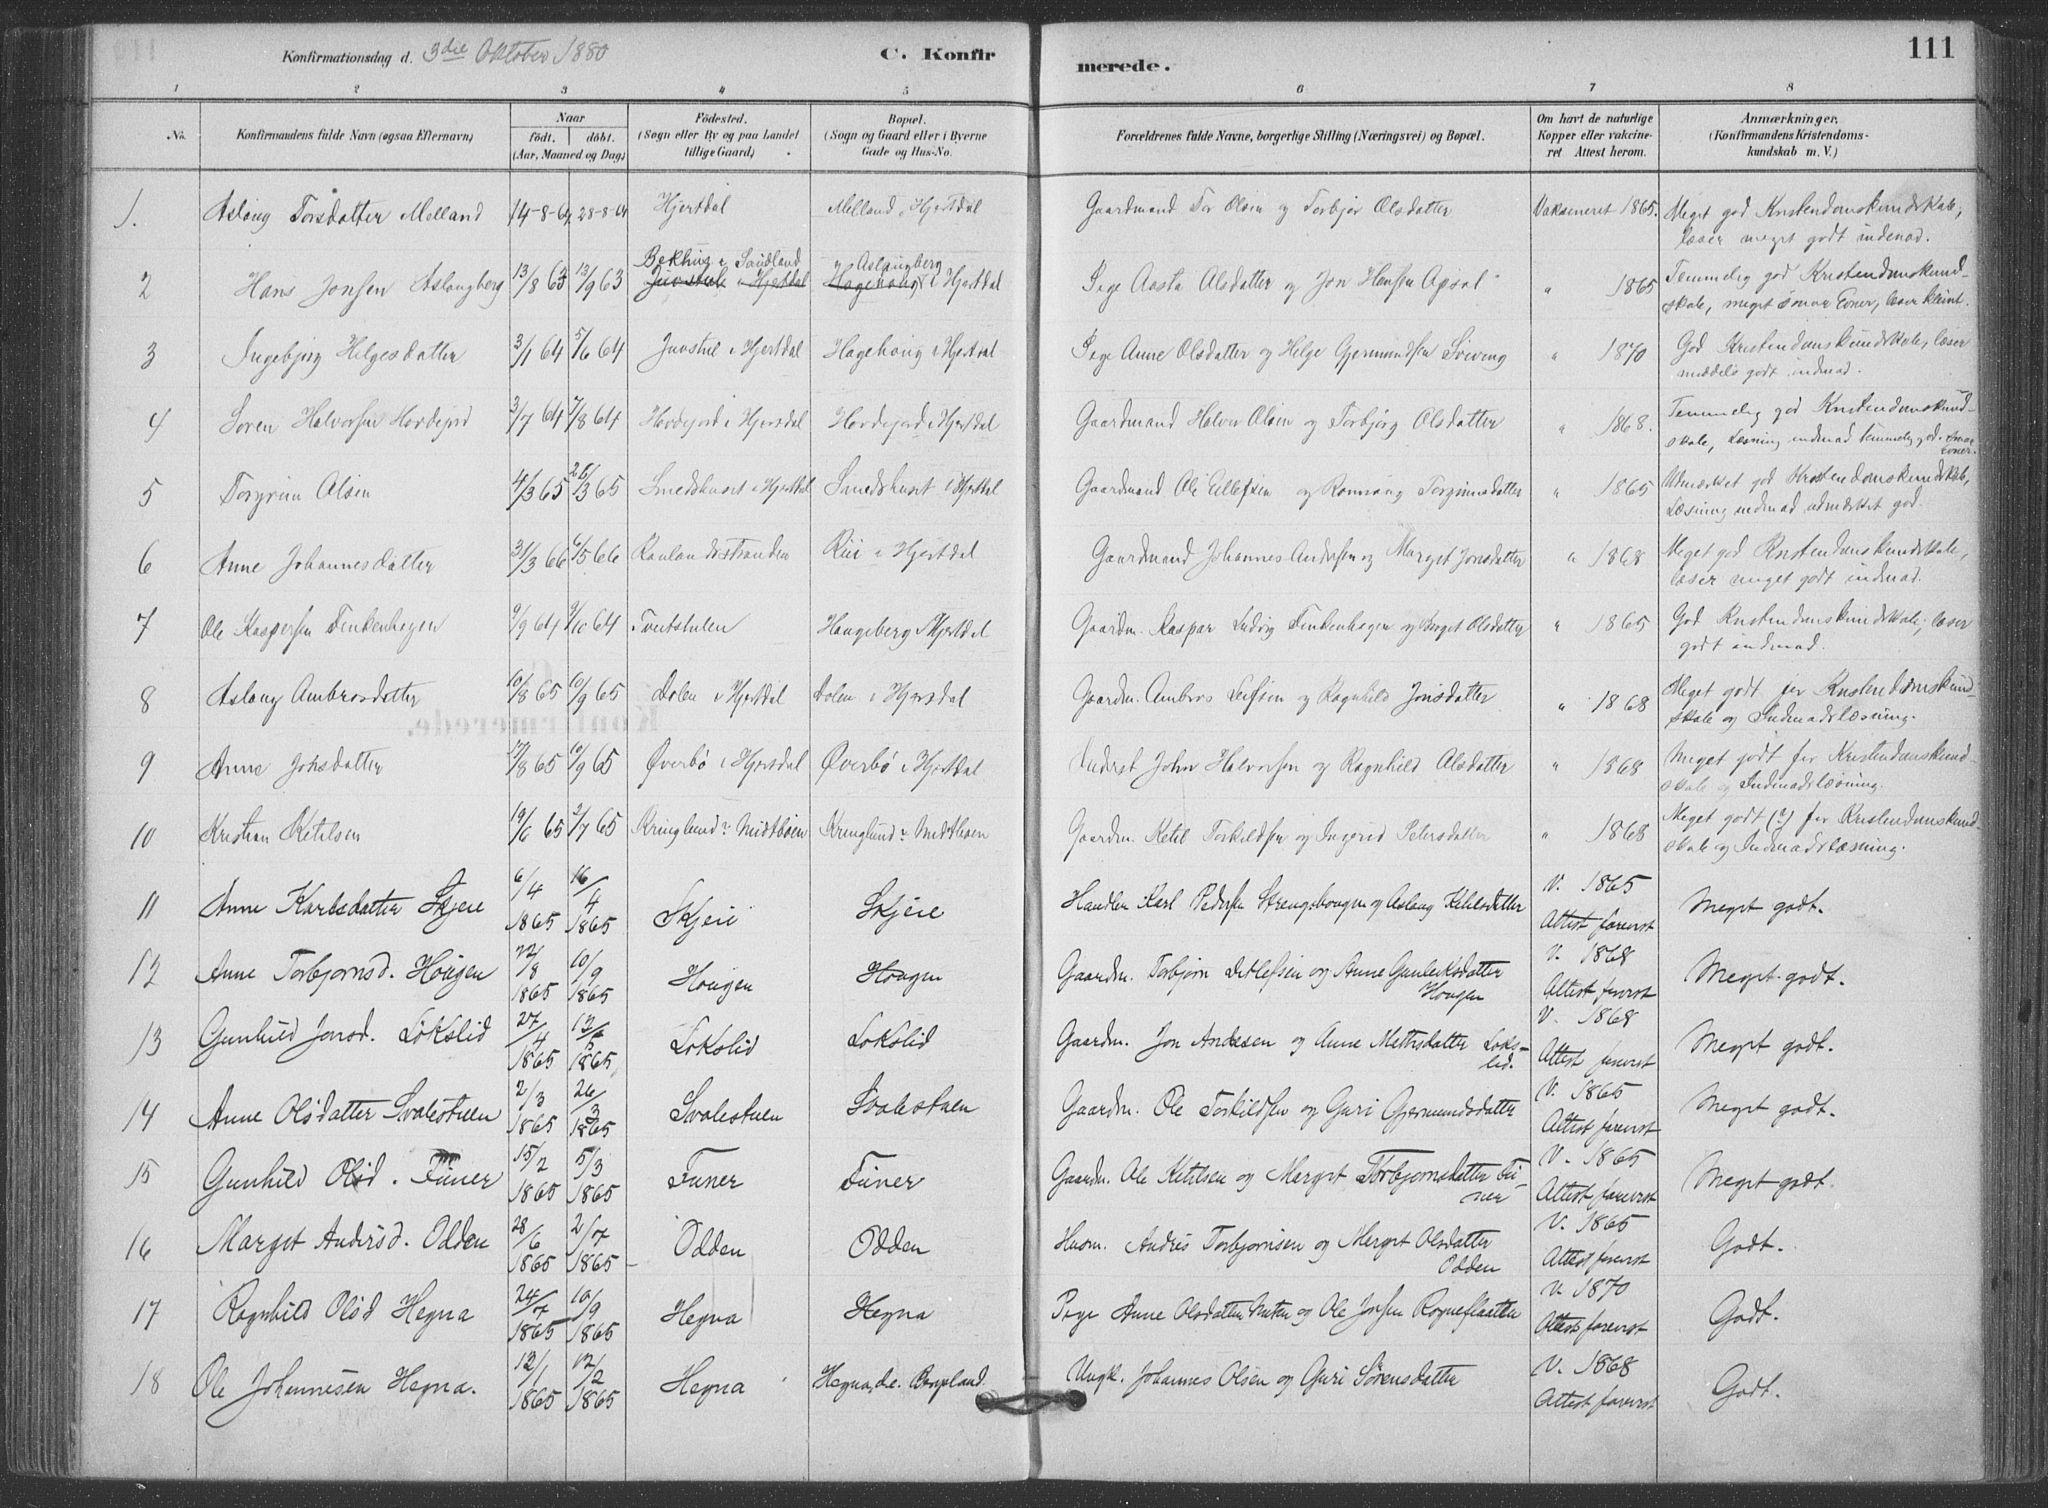 SAKO, Hjartdal kirkebøker, F/Fa/L0010: Ministerialbok nr. I 10, 1880-1929, s. 111